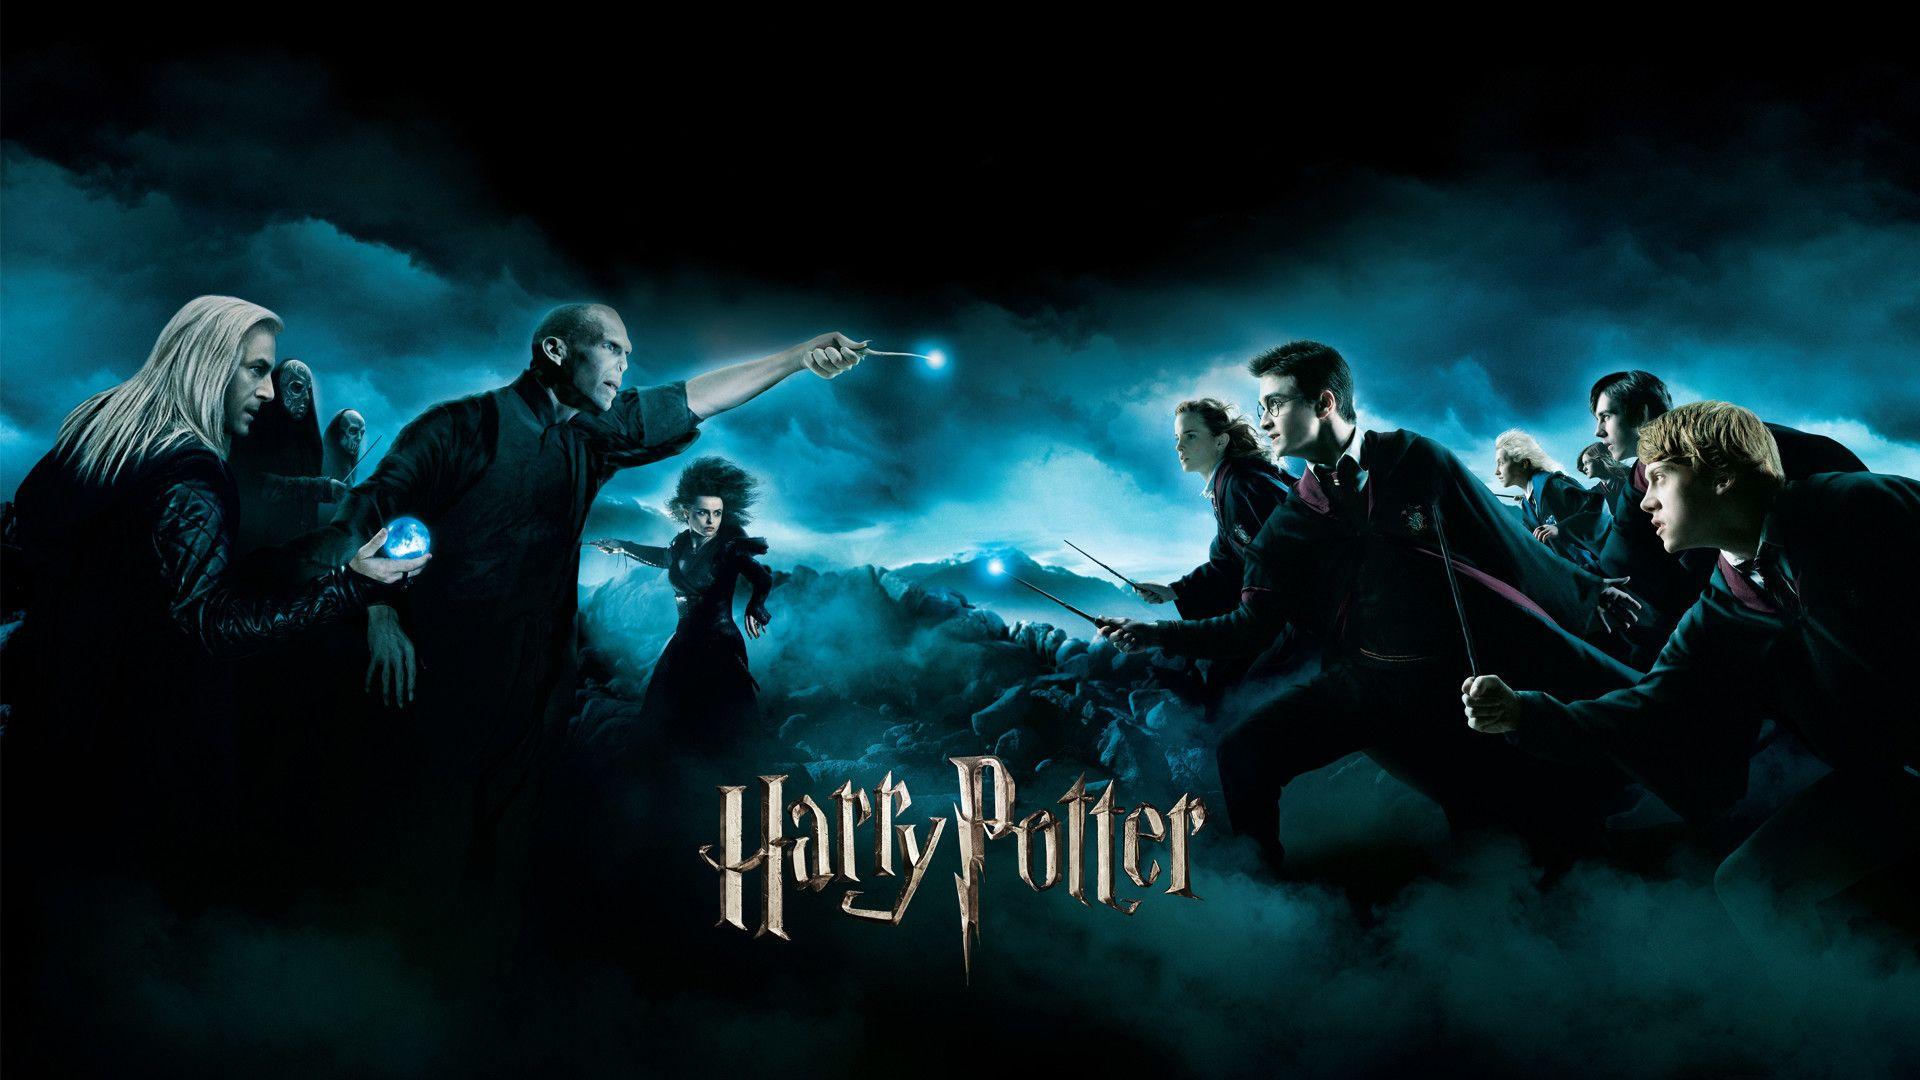 1920x1080 Harry Potter Wallpaper 1920x1080 1 Hebus Org High Definition Harry Potter Tumblr Harry Potter Todos Os Filmes Fatos De Harry Potter